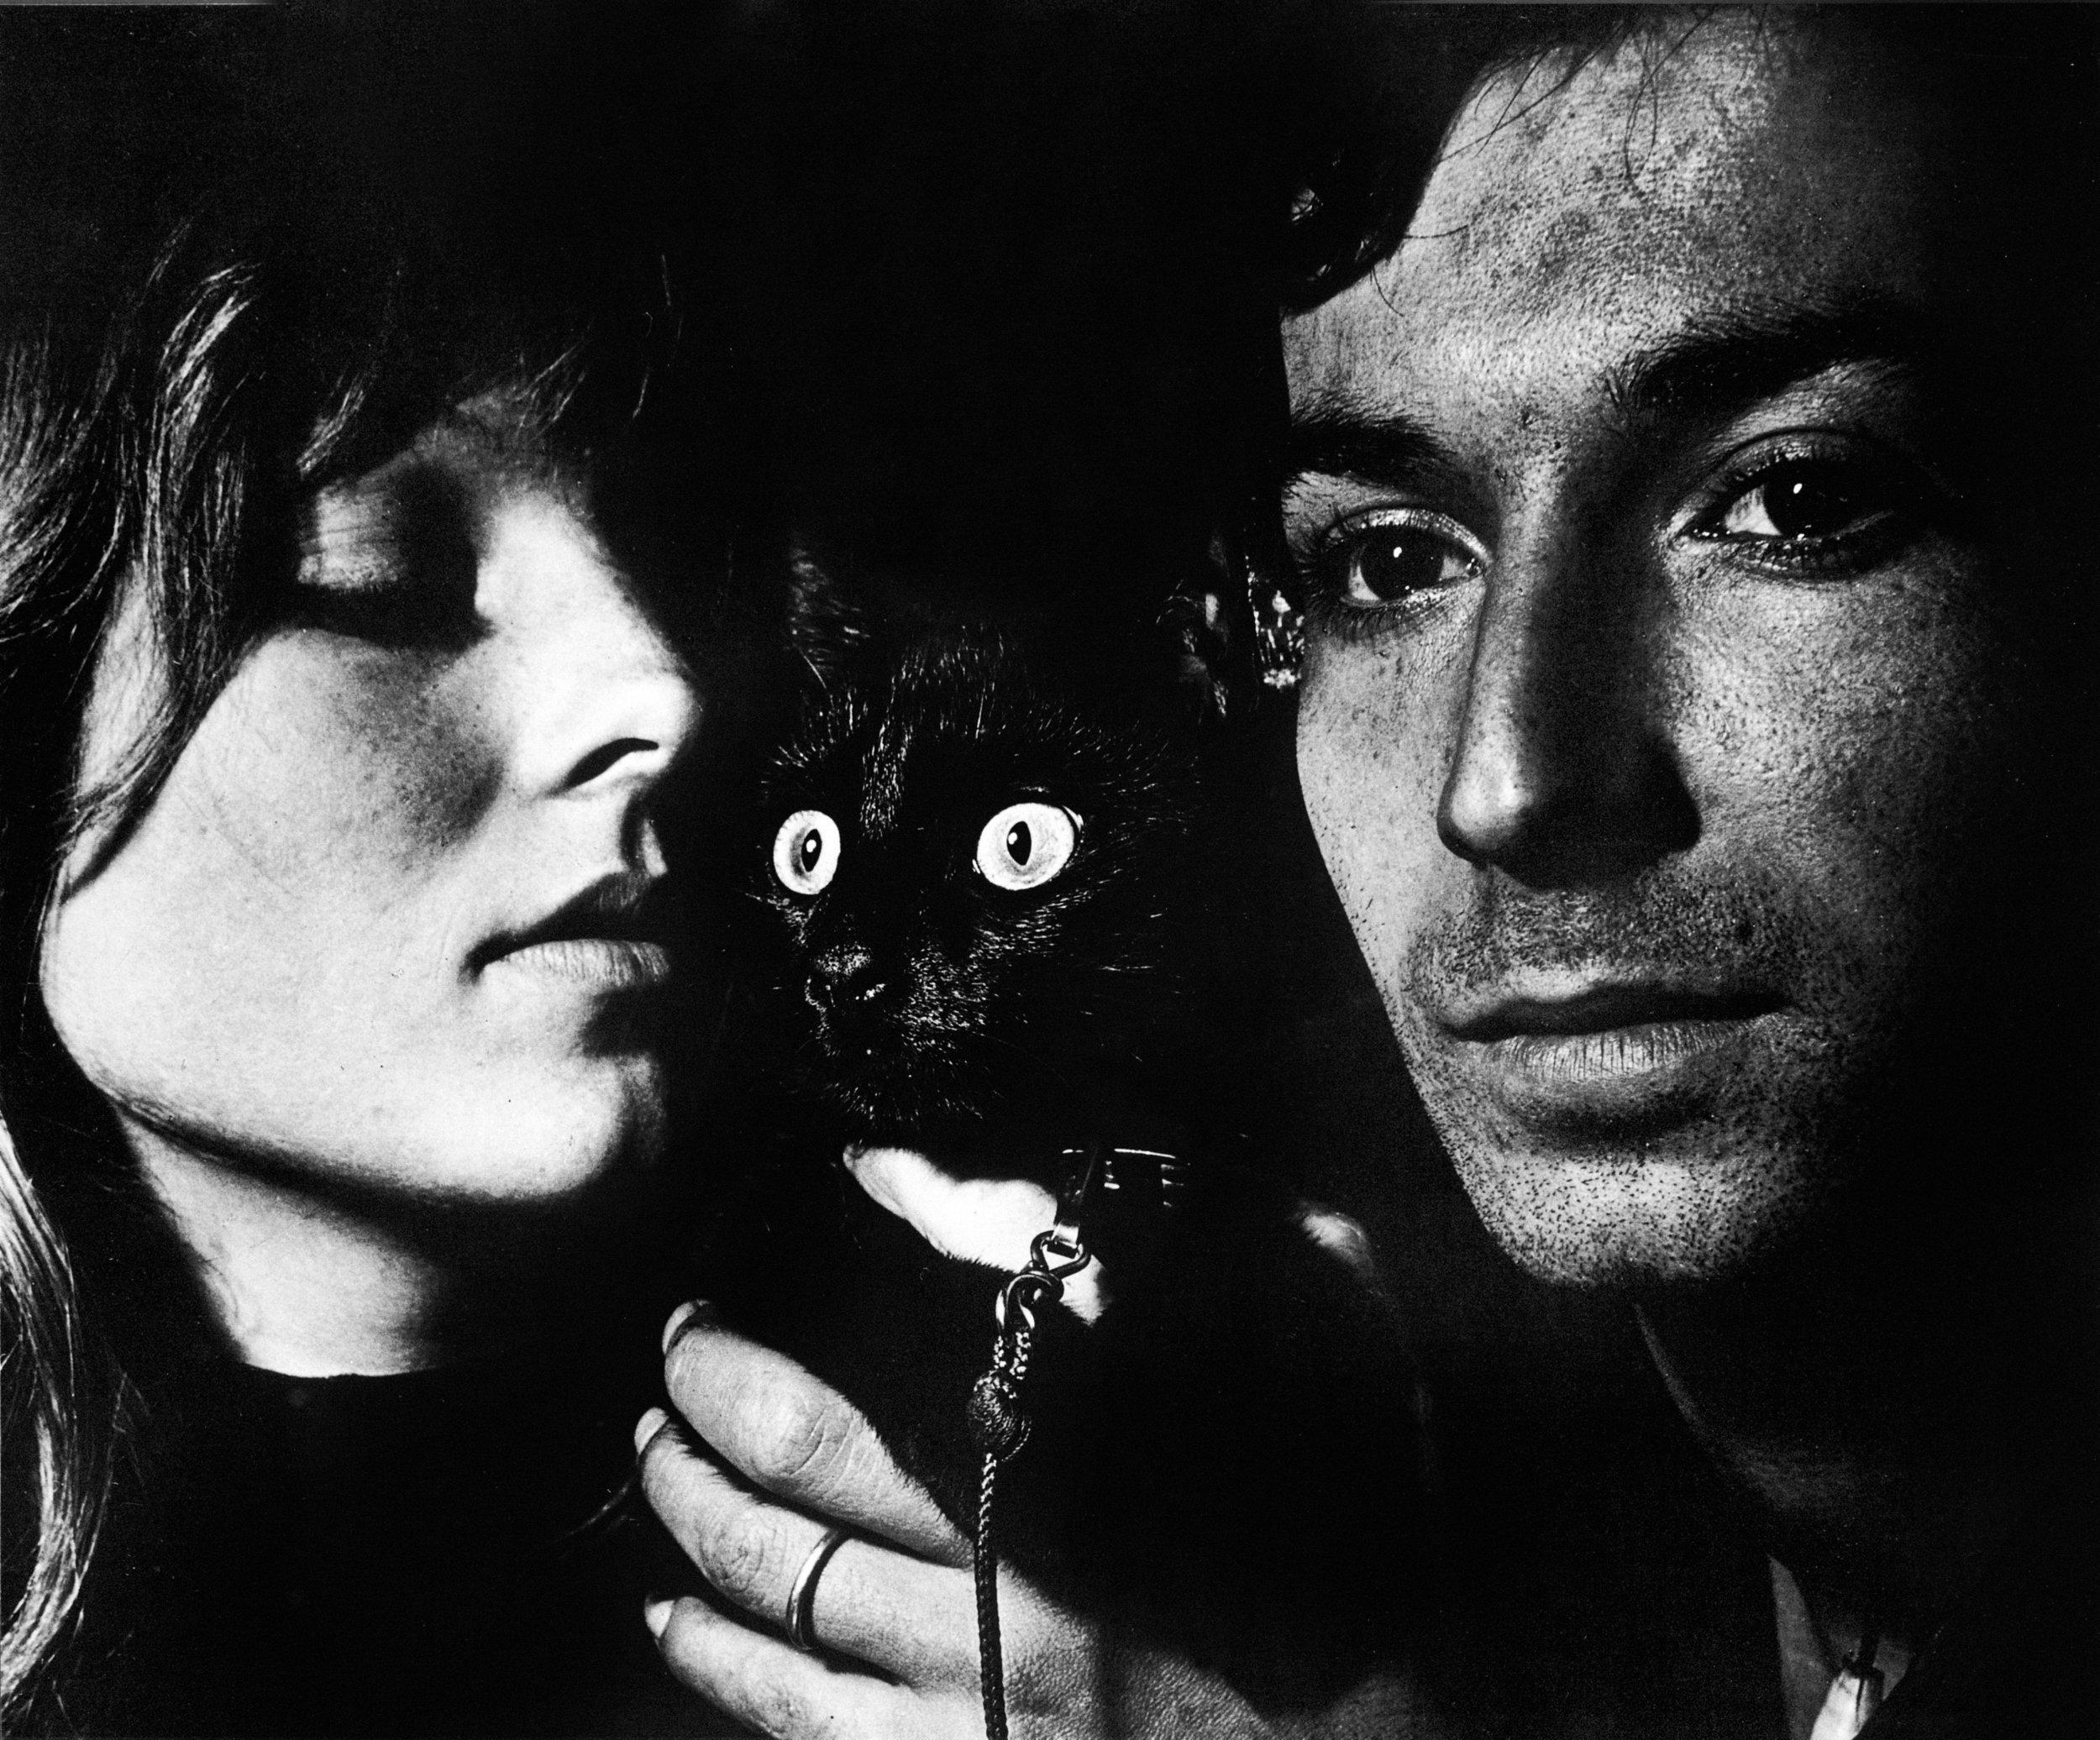 Autoportrait avec Aya Kando, Sèvres, France, 1953 © Ed van der Elsken / Nederlands Fotomuseum, courtesy Annet Gelink Gallery & Folia Gallery, Paris.